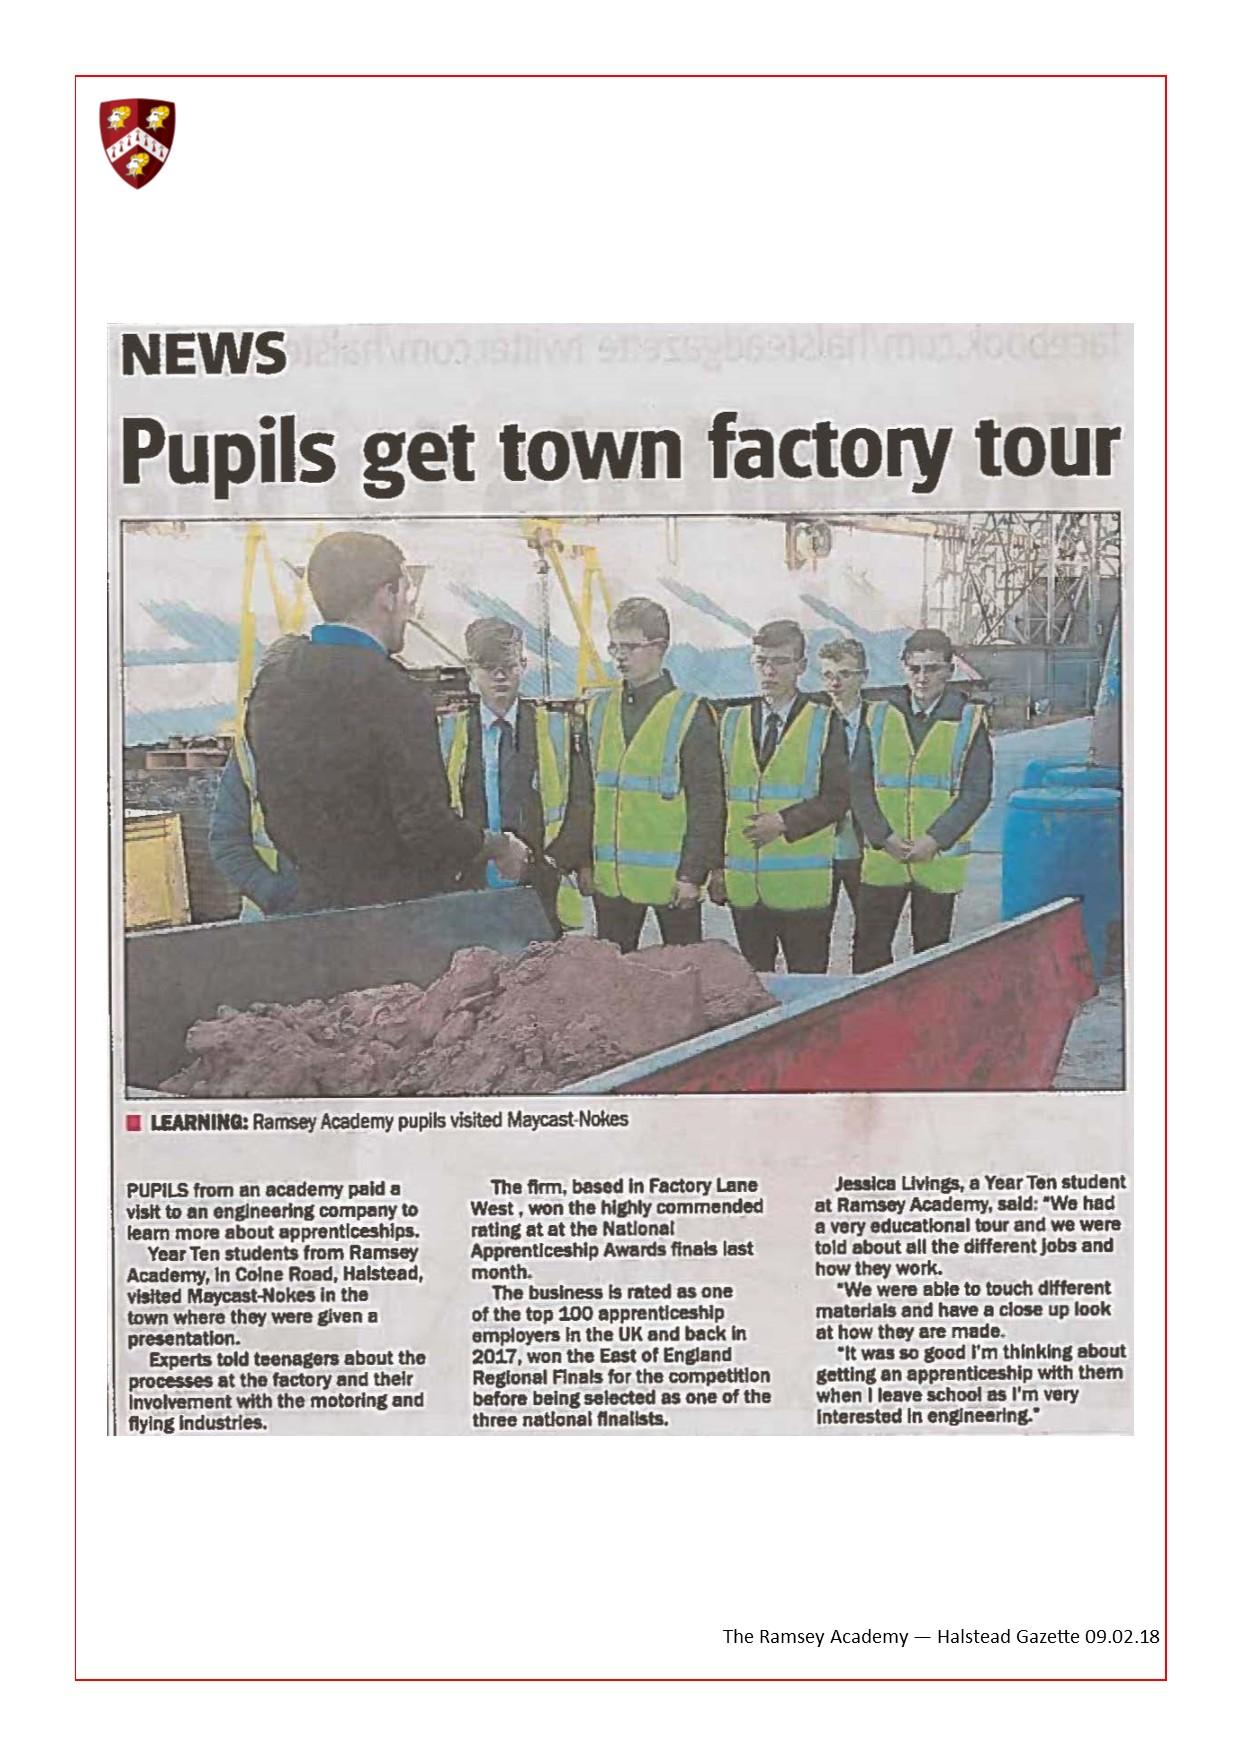 Pupils get Town Factory Tour 09.02.18